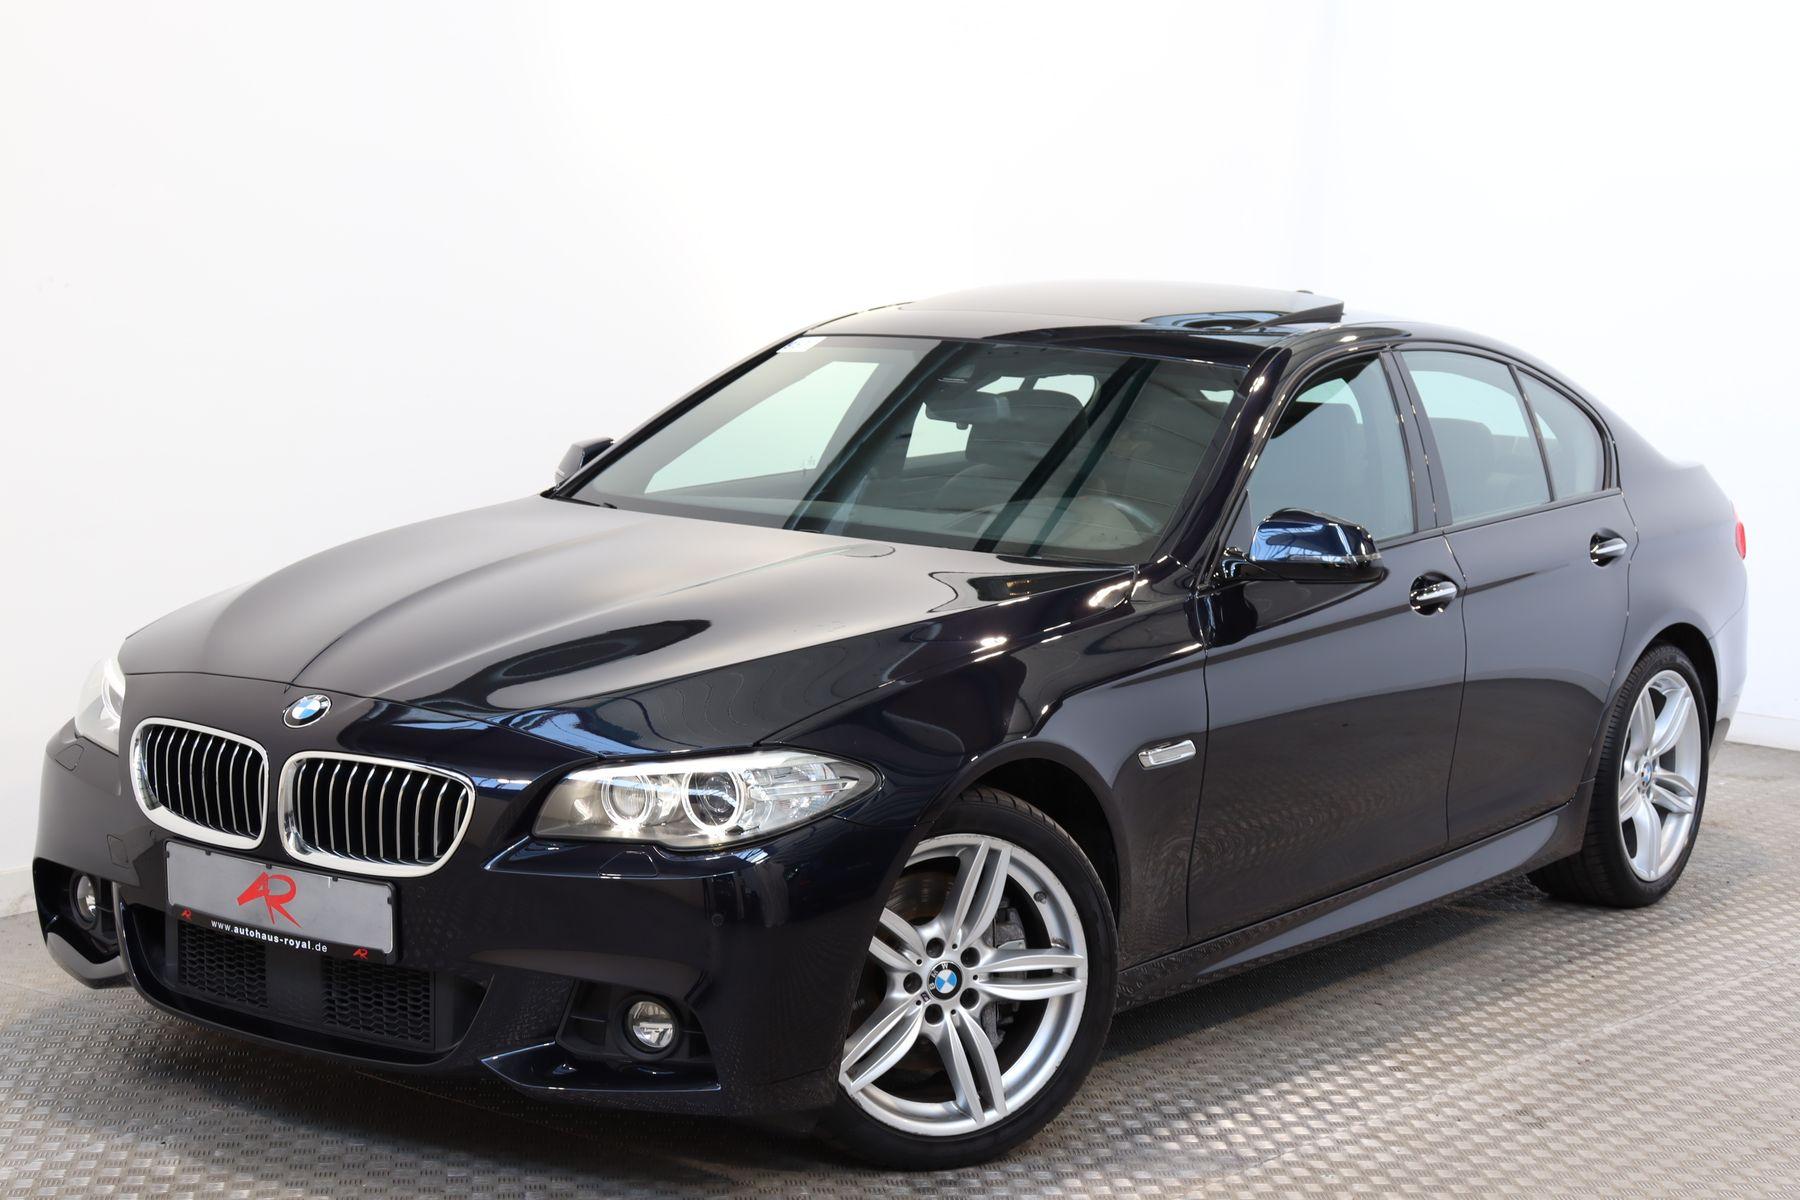 BMW 530 d xDrive SAG M SPORT EXKLUSIV DIG.TACHO,19Z., Jahr 2016, Diesel